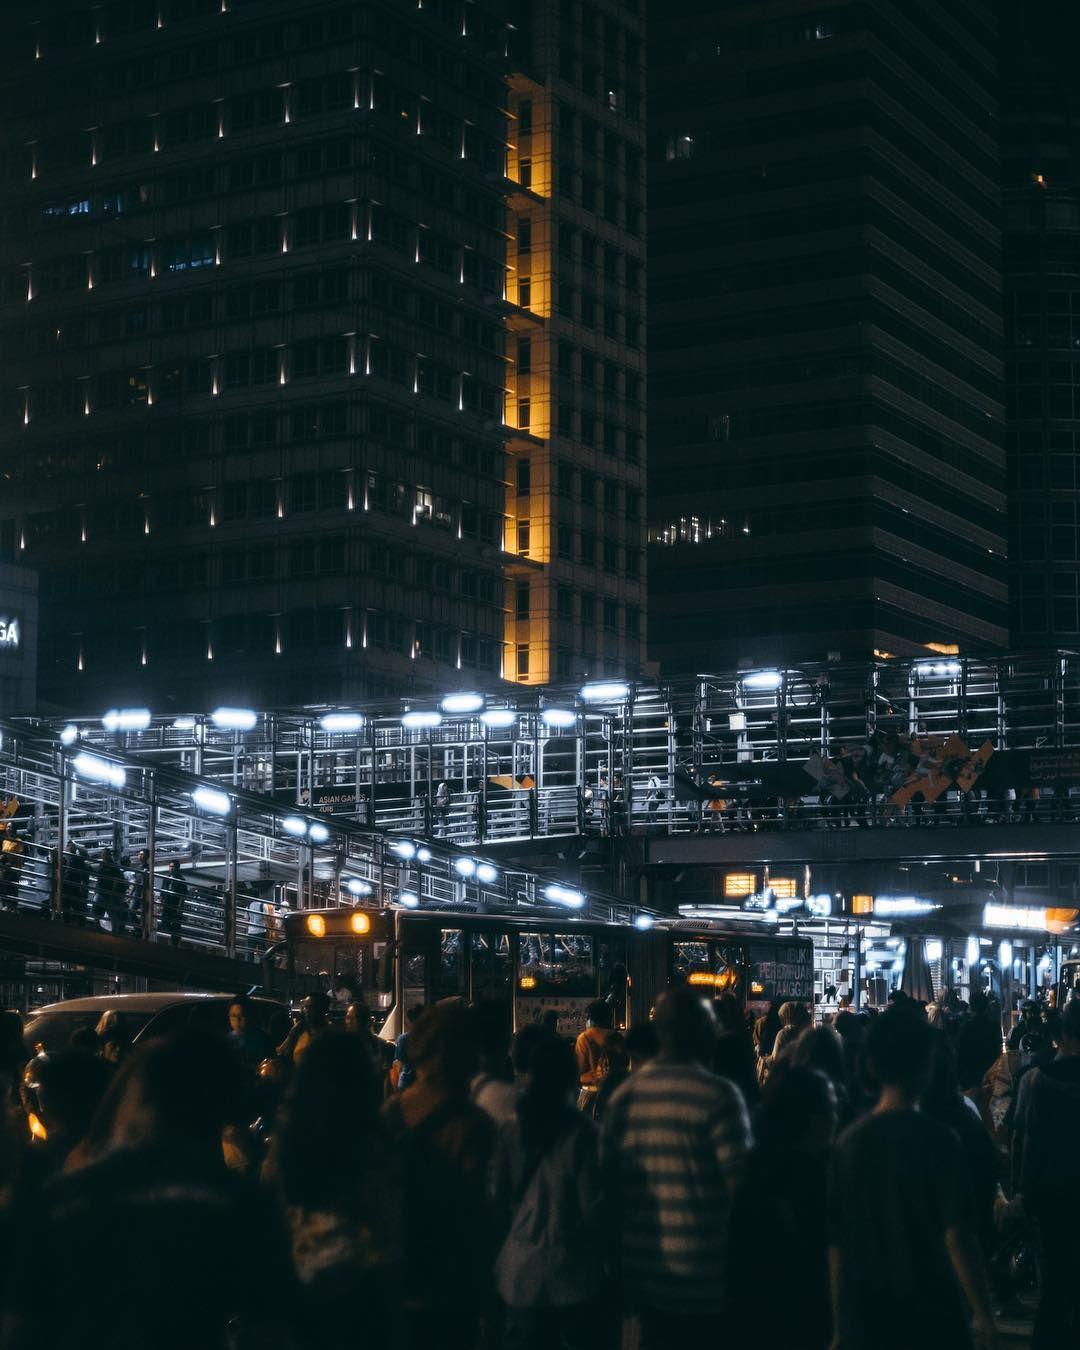 Gambar Mungkin Berisi Satu Orang Atau Lebih Malam Keramaian Gedung Pencakar Langit Dan Luar Ruangan Fotografi Urban Fotografi Jalanan Fotografi